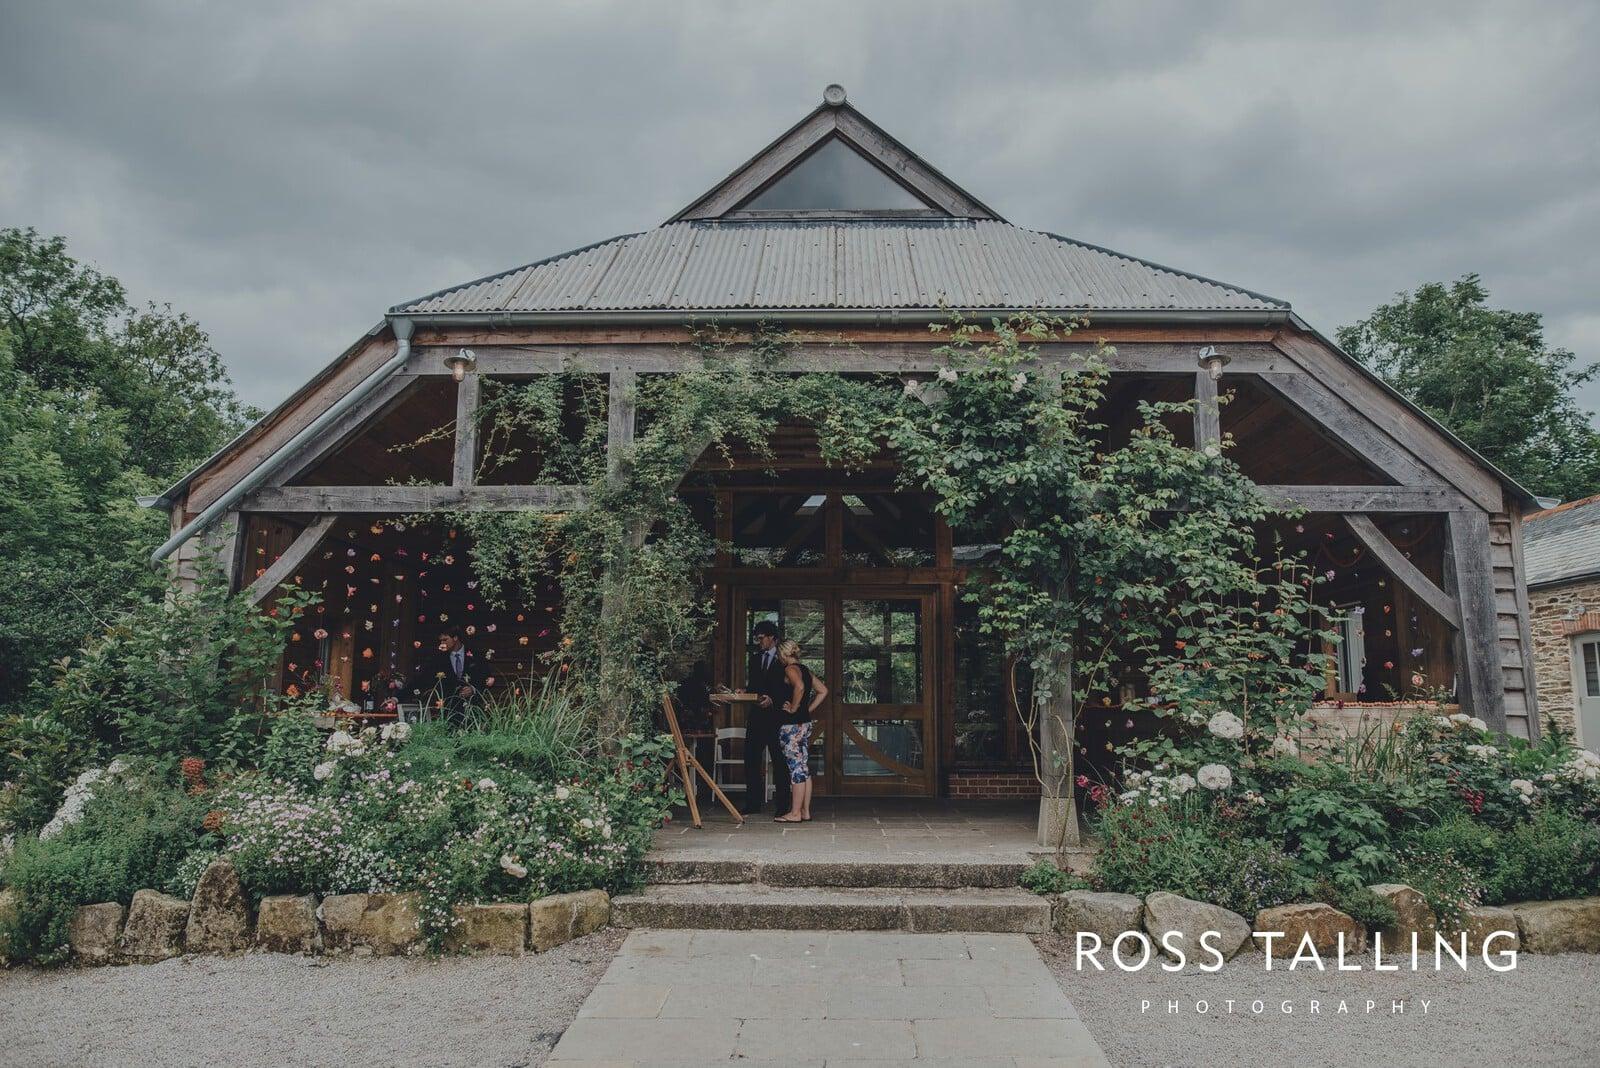 zara-adey-nancarow-farm-wedding-photography-cornwall_0012